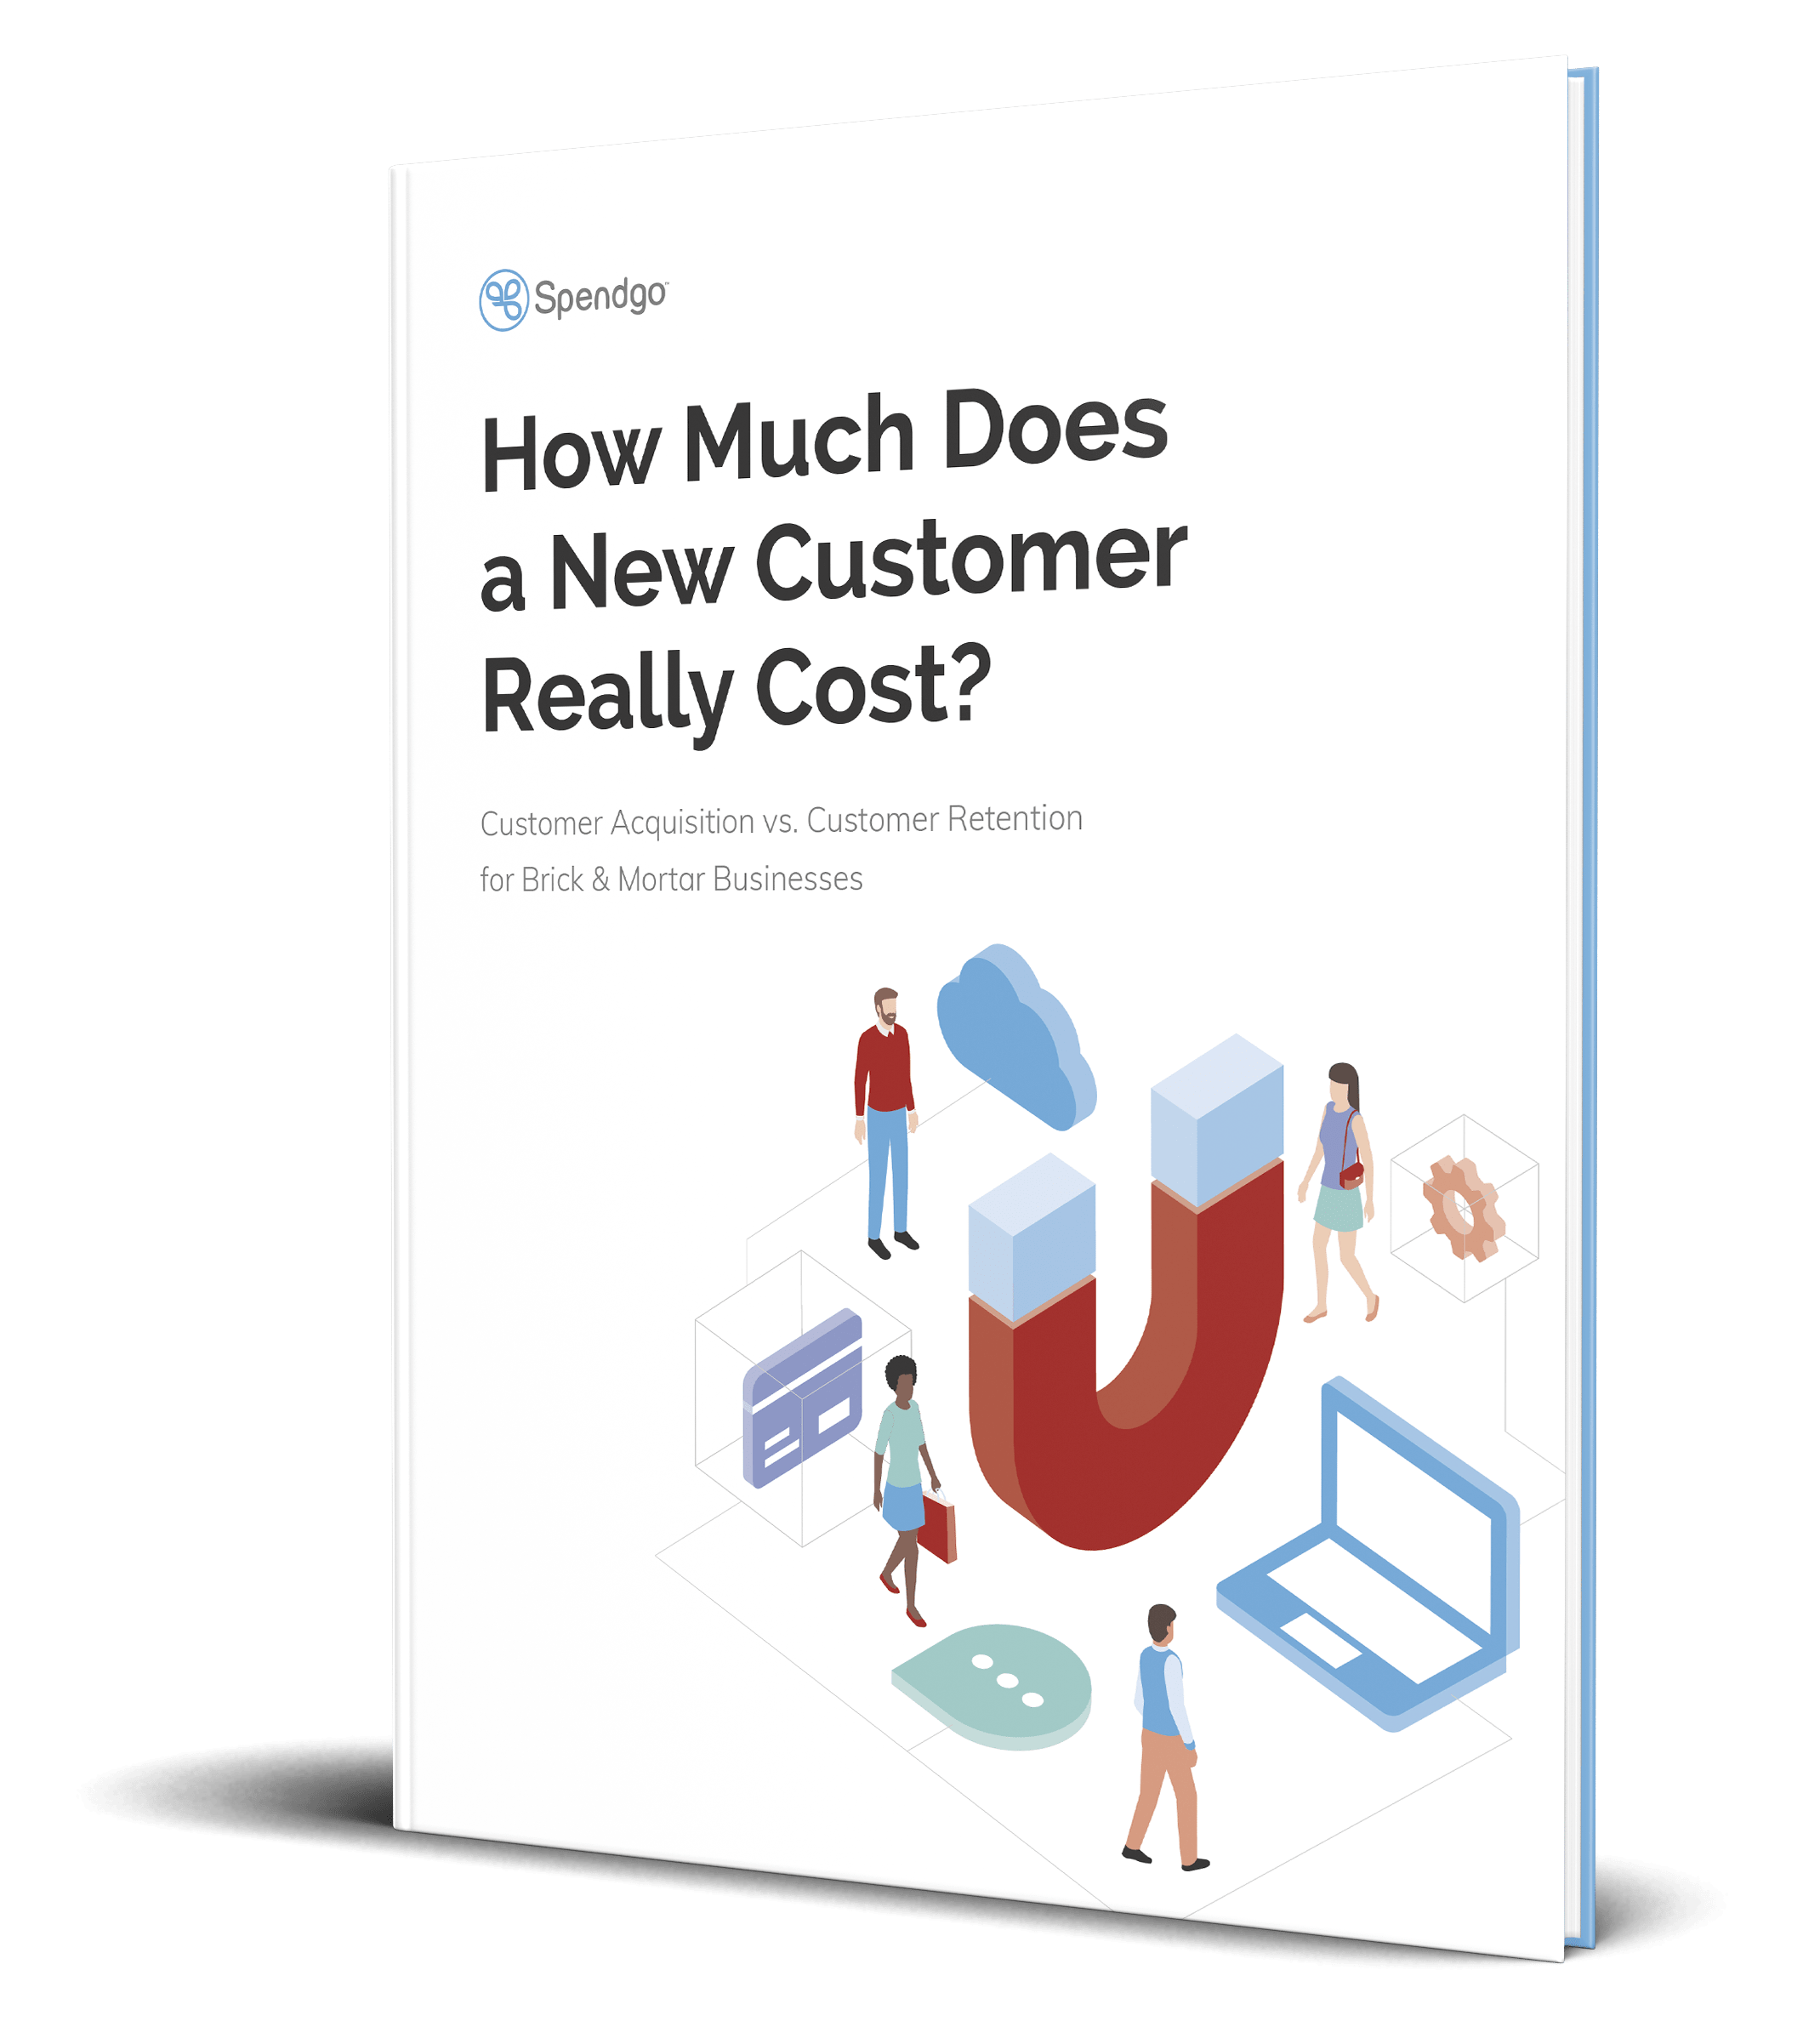 The Cost of Customer Retention vs. Customer Acquisition Whitepaper